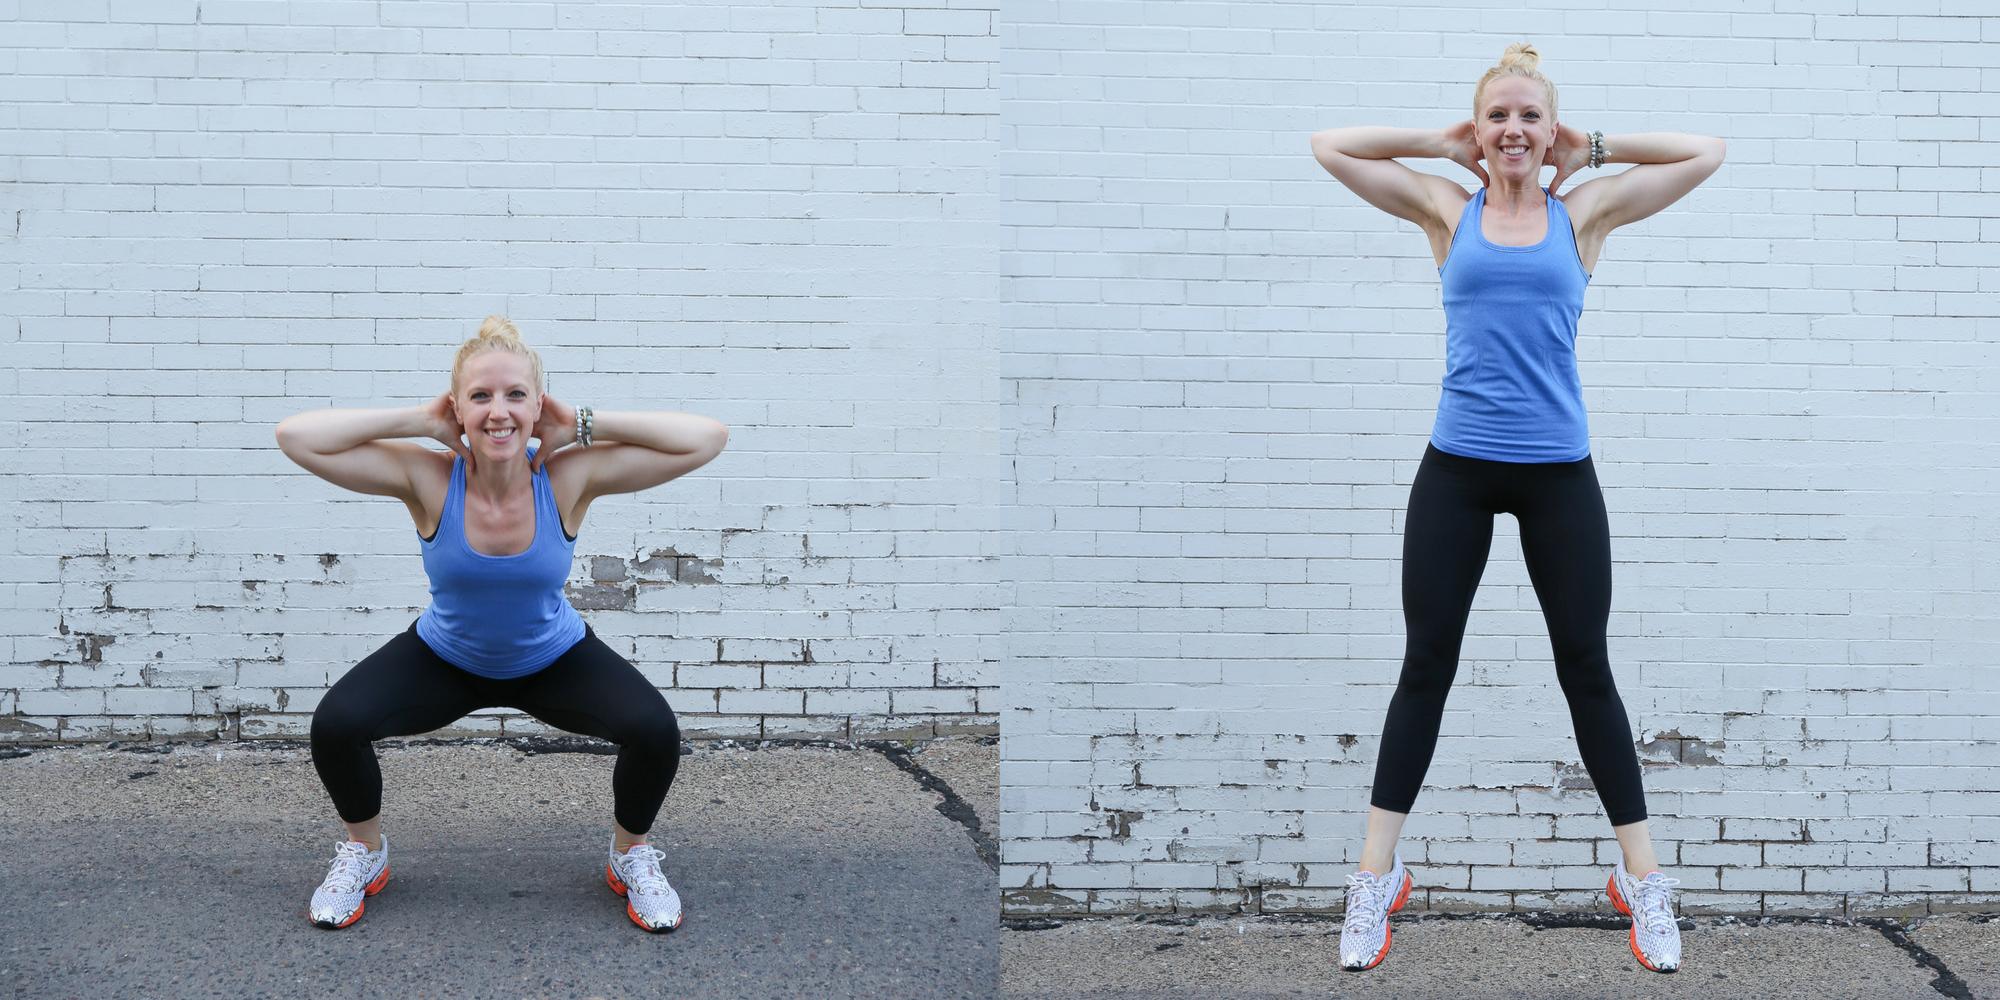 Prisoner squat jumps, squat jump variations, outdoor workout, workout, exercise